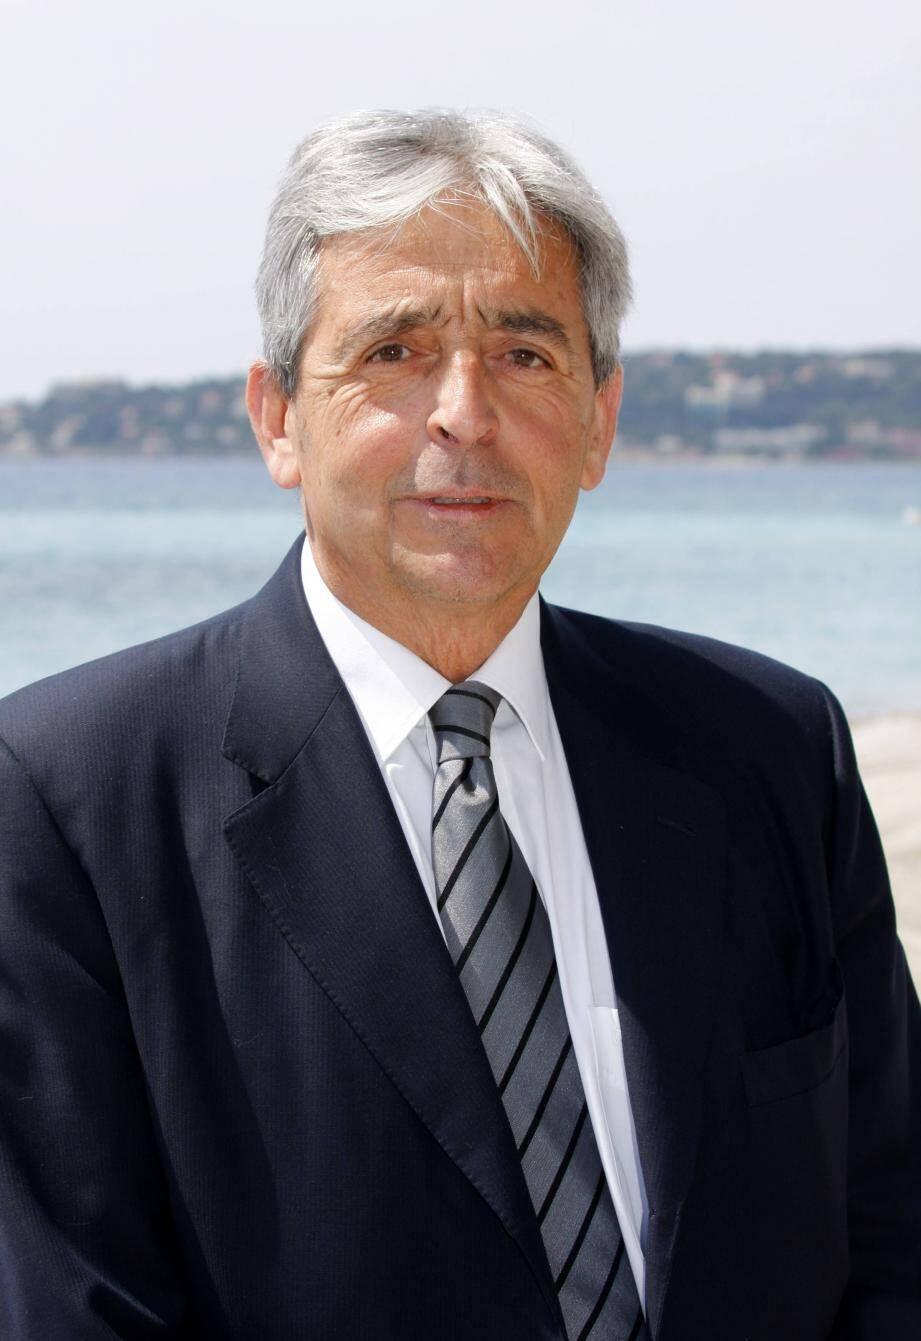 Thierry Giorgio ne donnera pas de consignes de vote pour mars prochain.